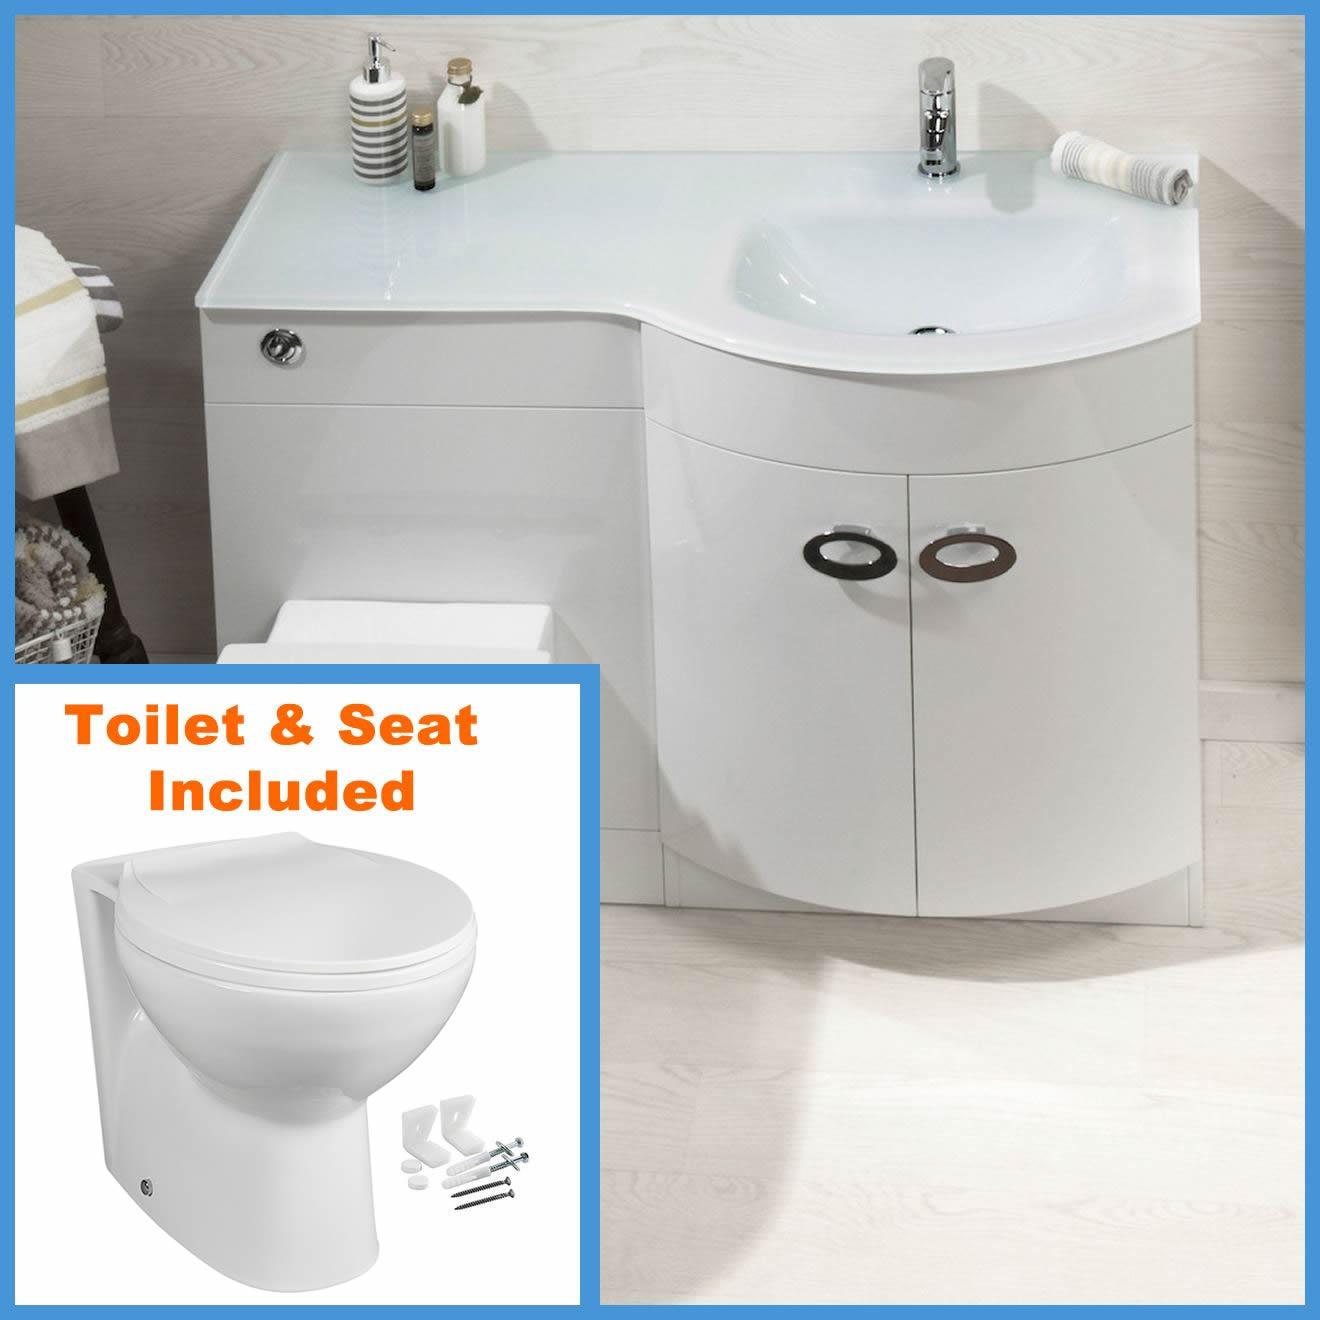 d shape bathroom vanity unit basin sink bathroom wc unit btw toilet white glass ebay. Black Bedroom Furniture Sets. Home Design Ideas